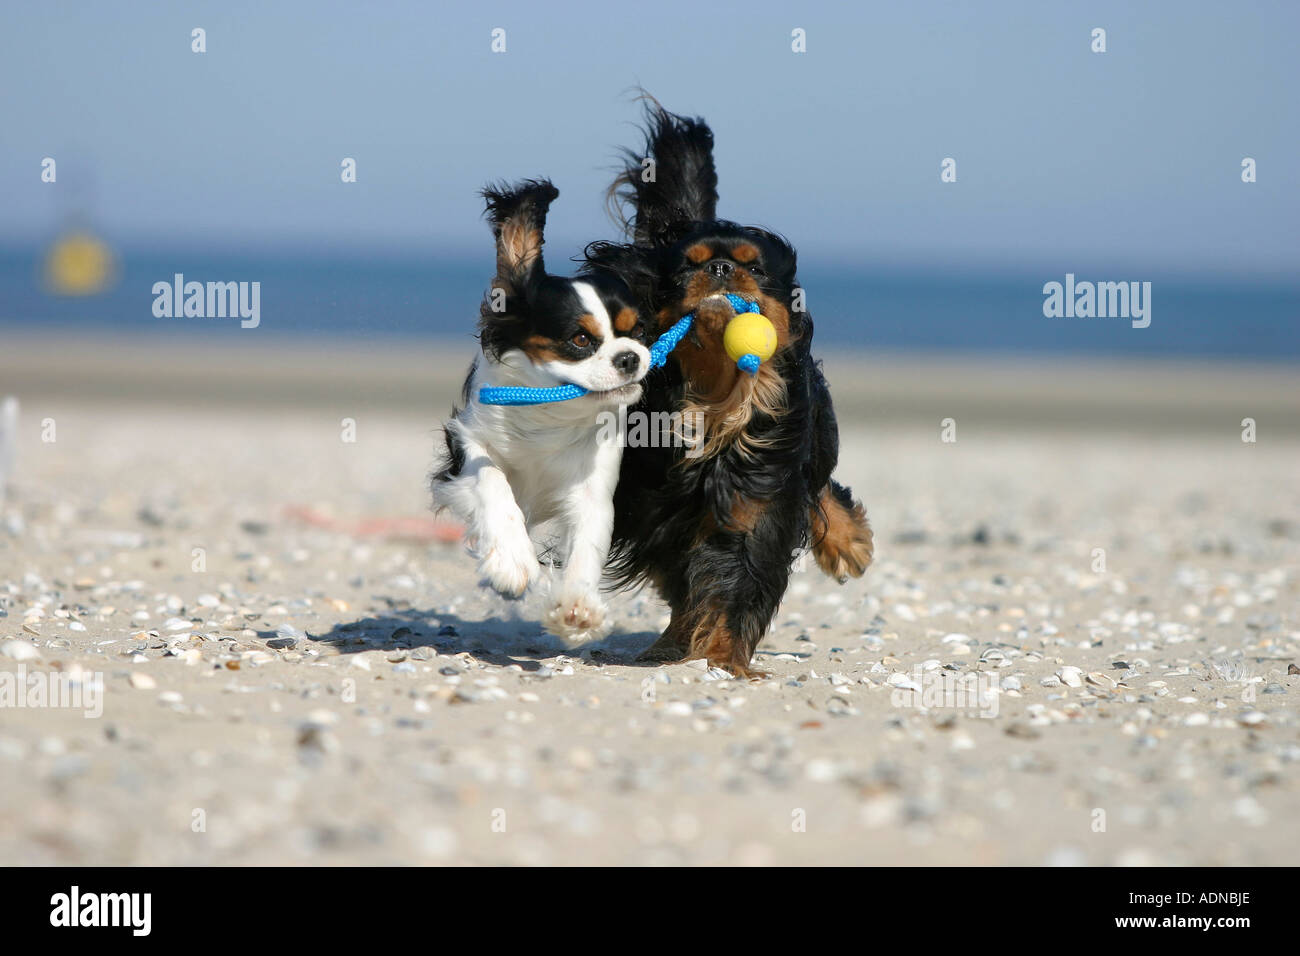 Cavalier King Charles Spaniel retrieving ball at beach Stock Photo